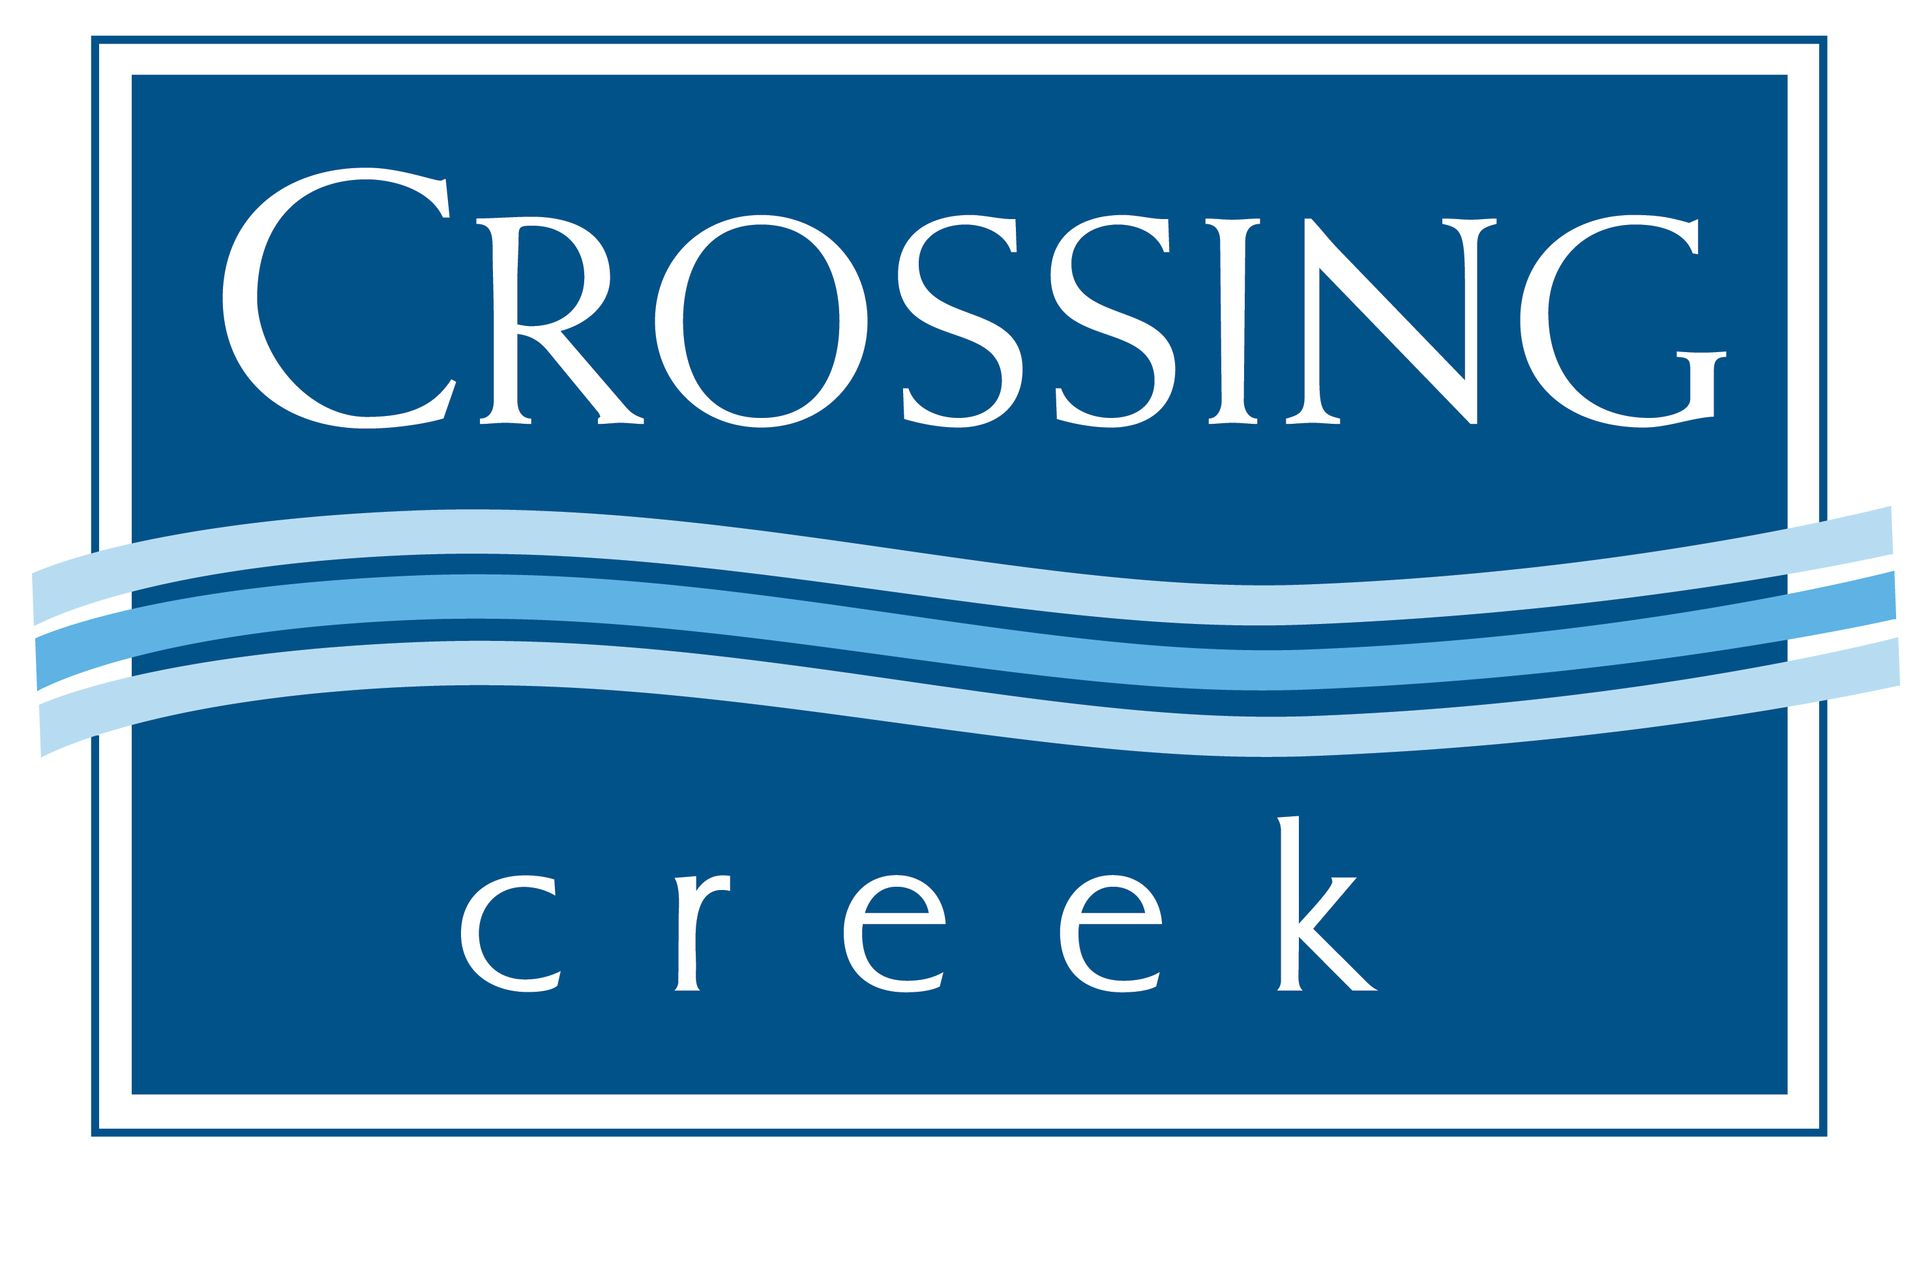 Crossing Creek,46373